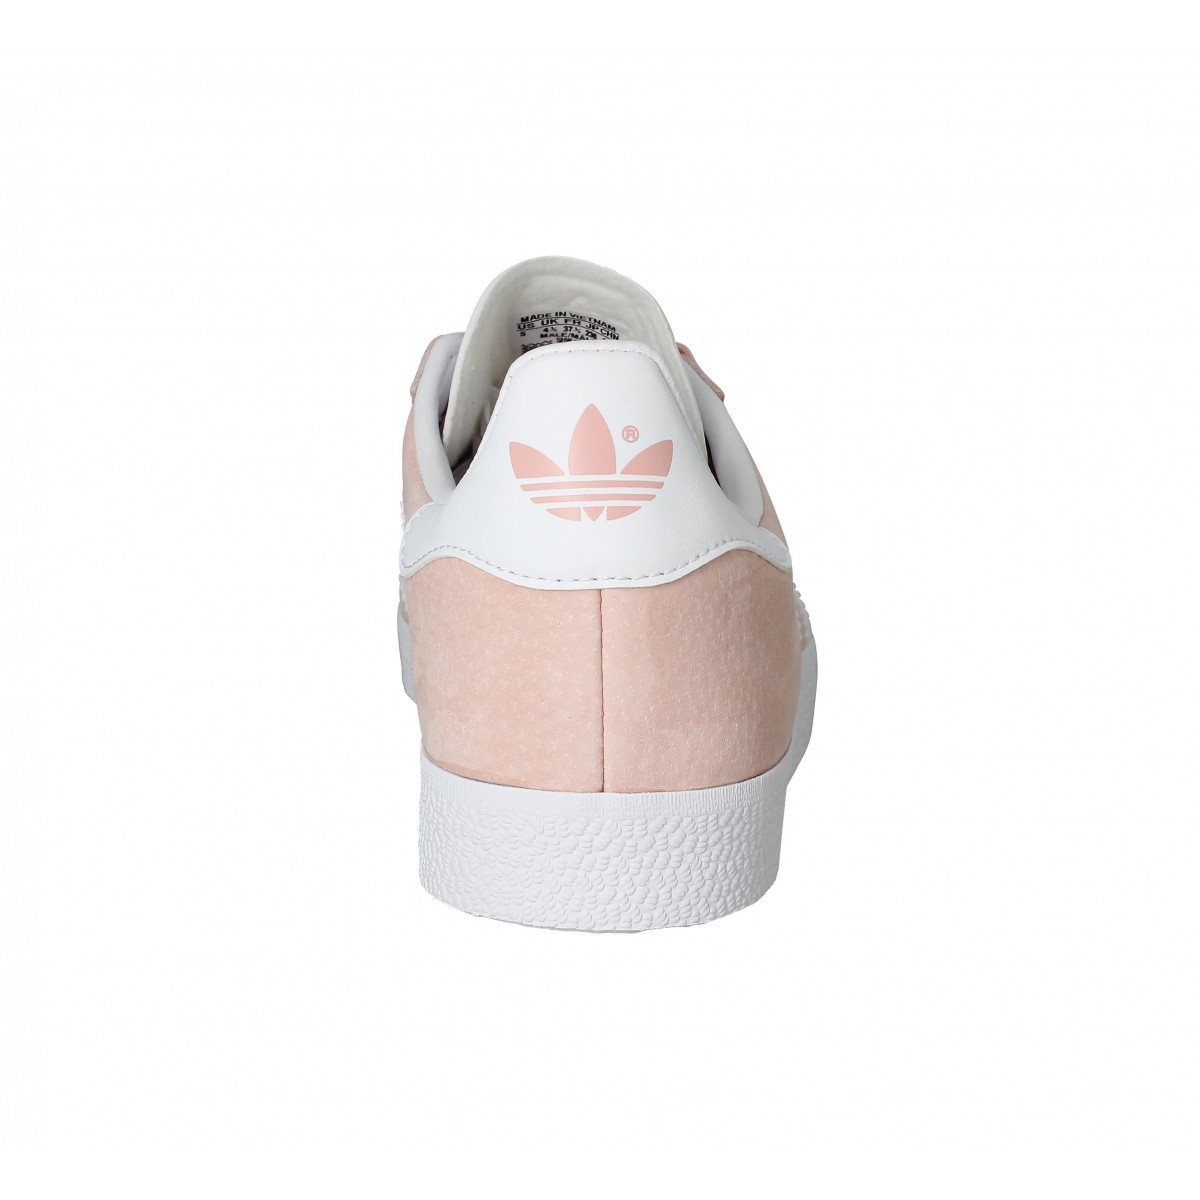 Chaussures Adidas gazelle rose vapeur femme | Fanny chaussures